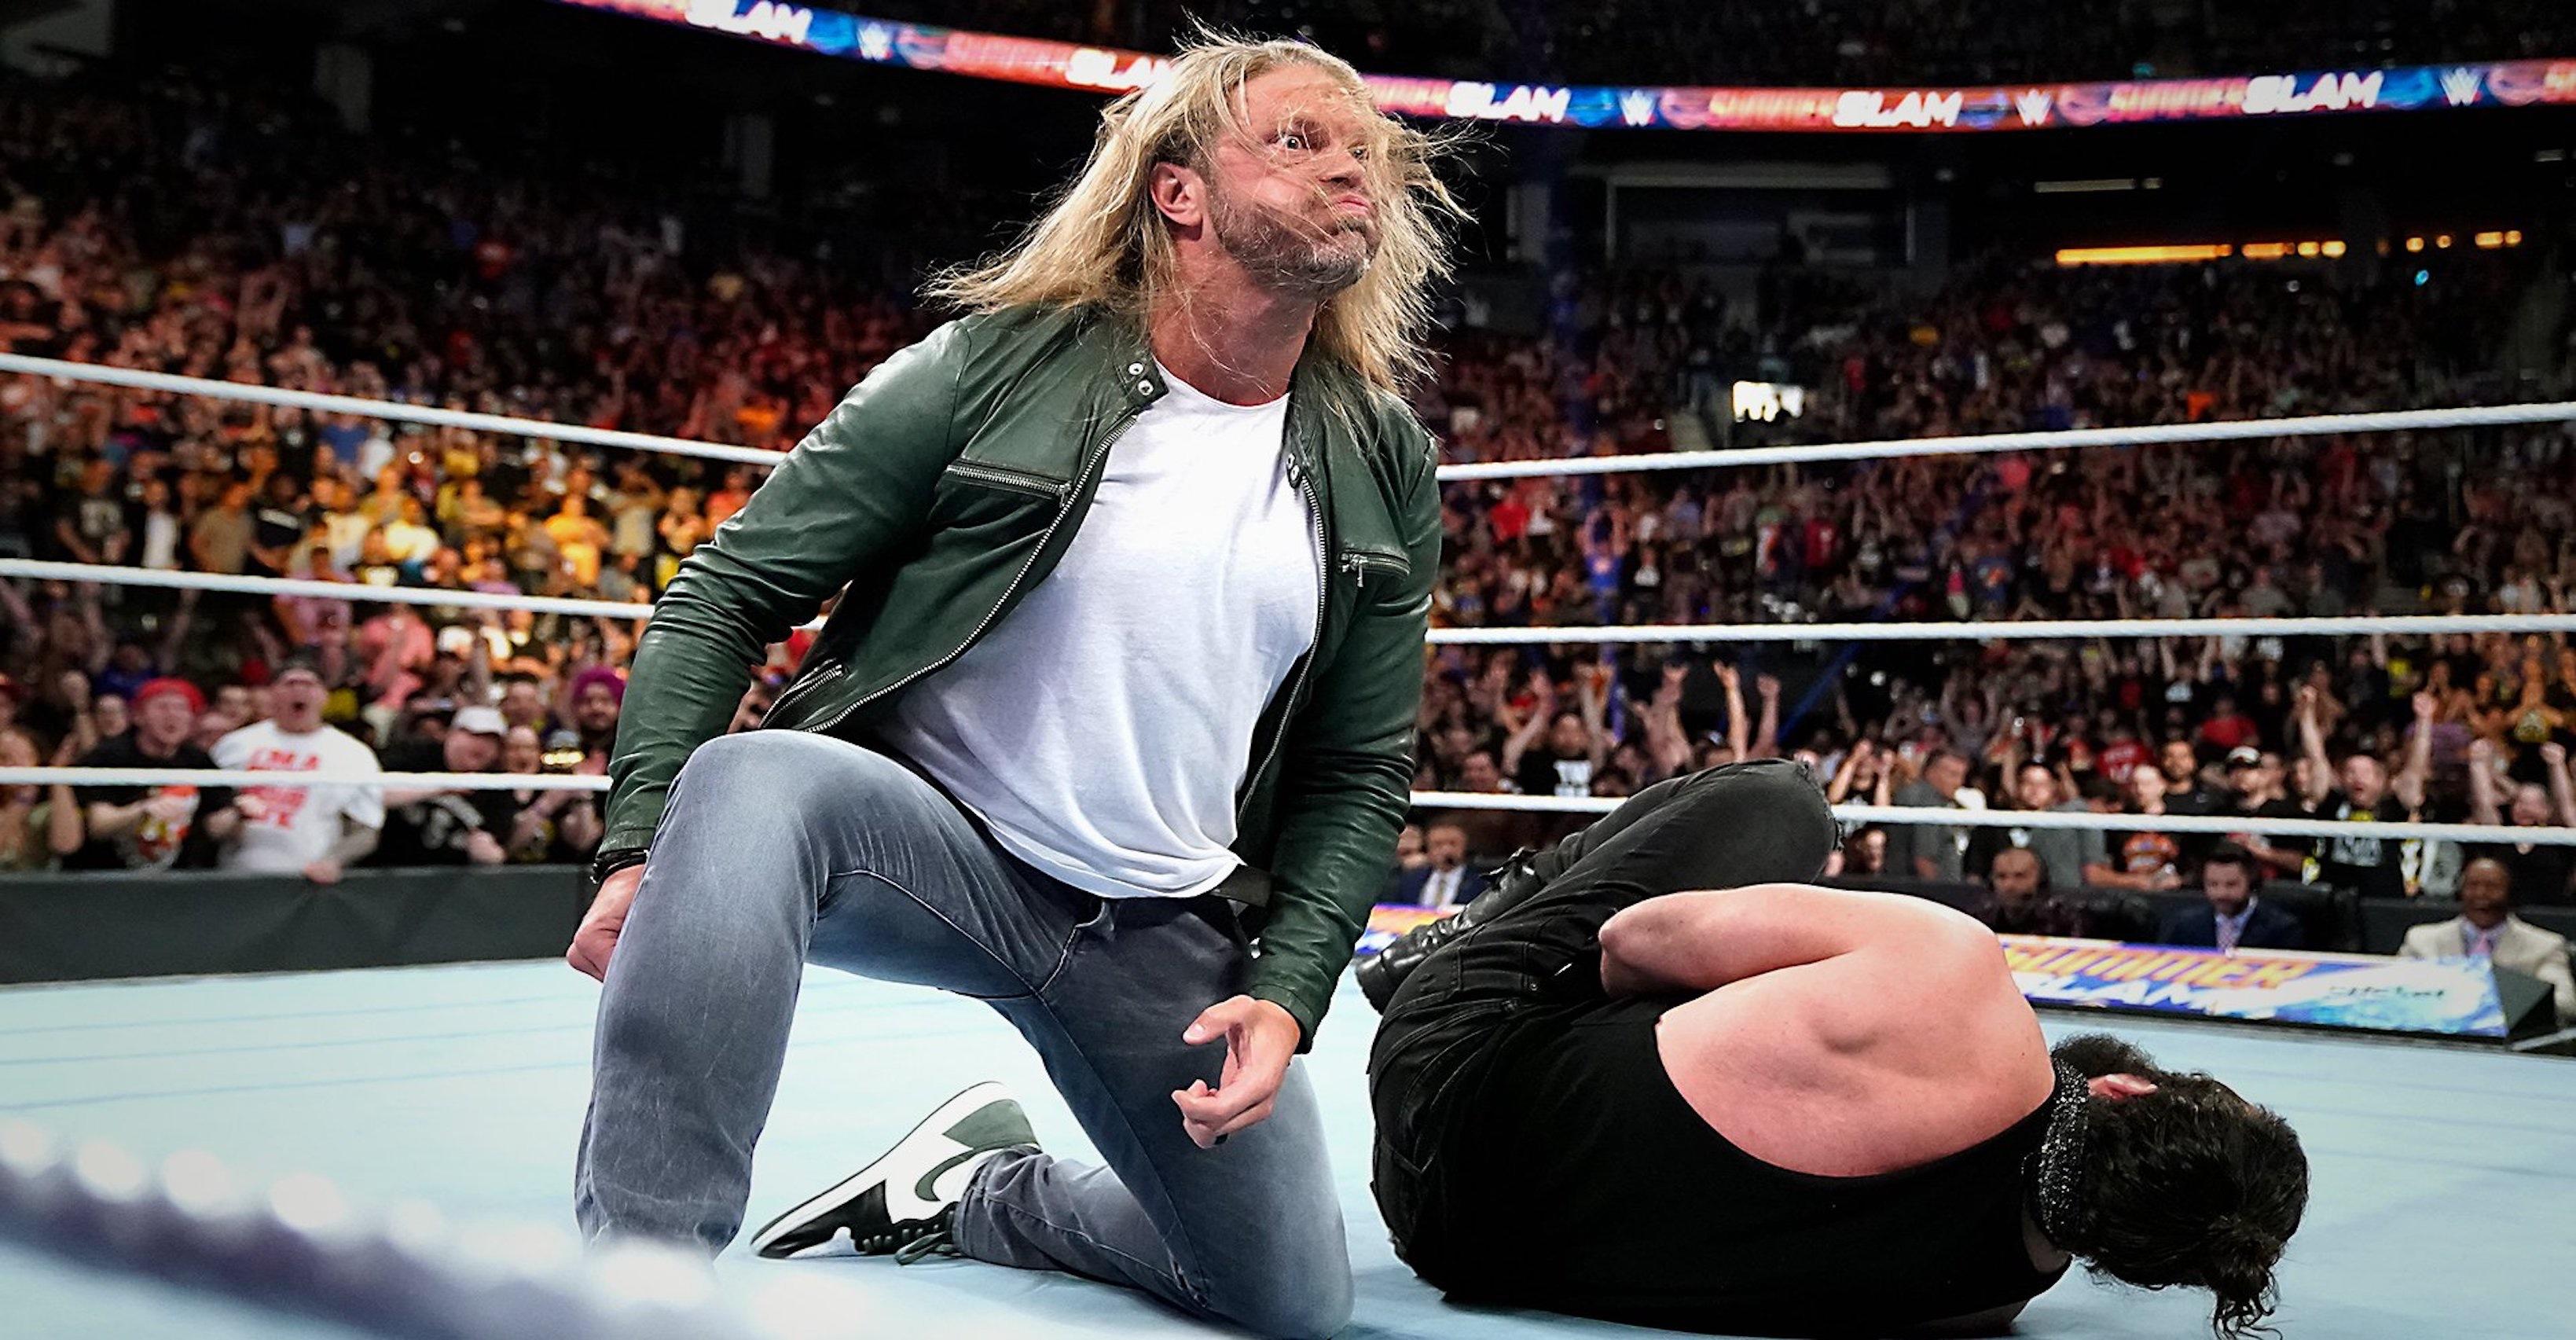 Edge Makes Definitive Statement Regarding WWE Future?